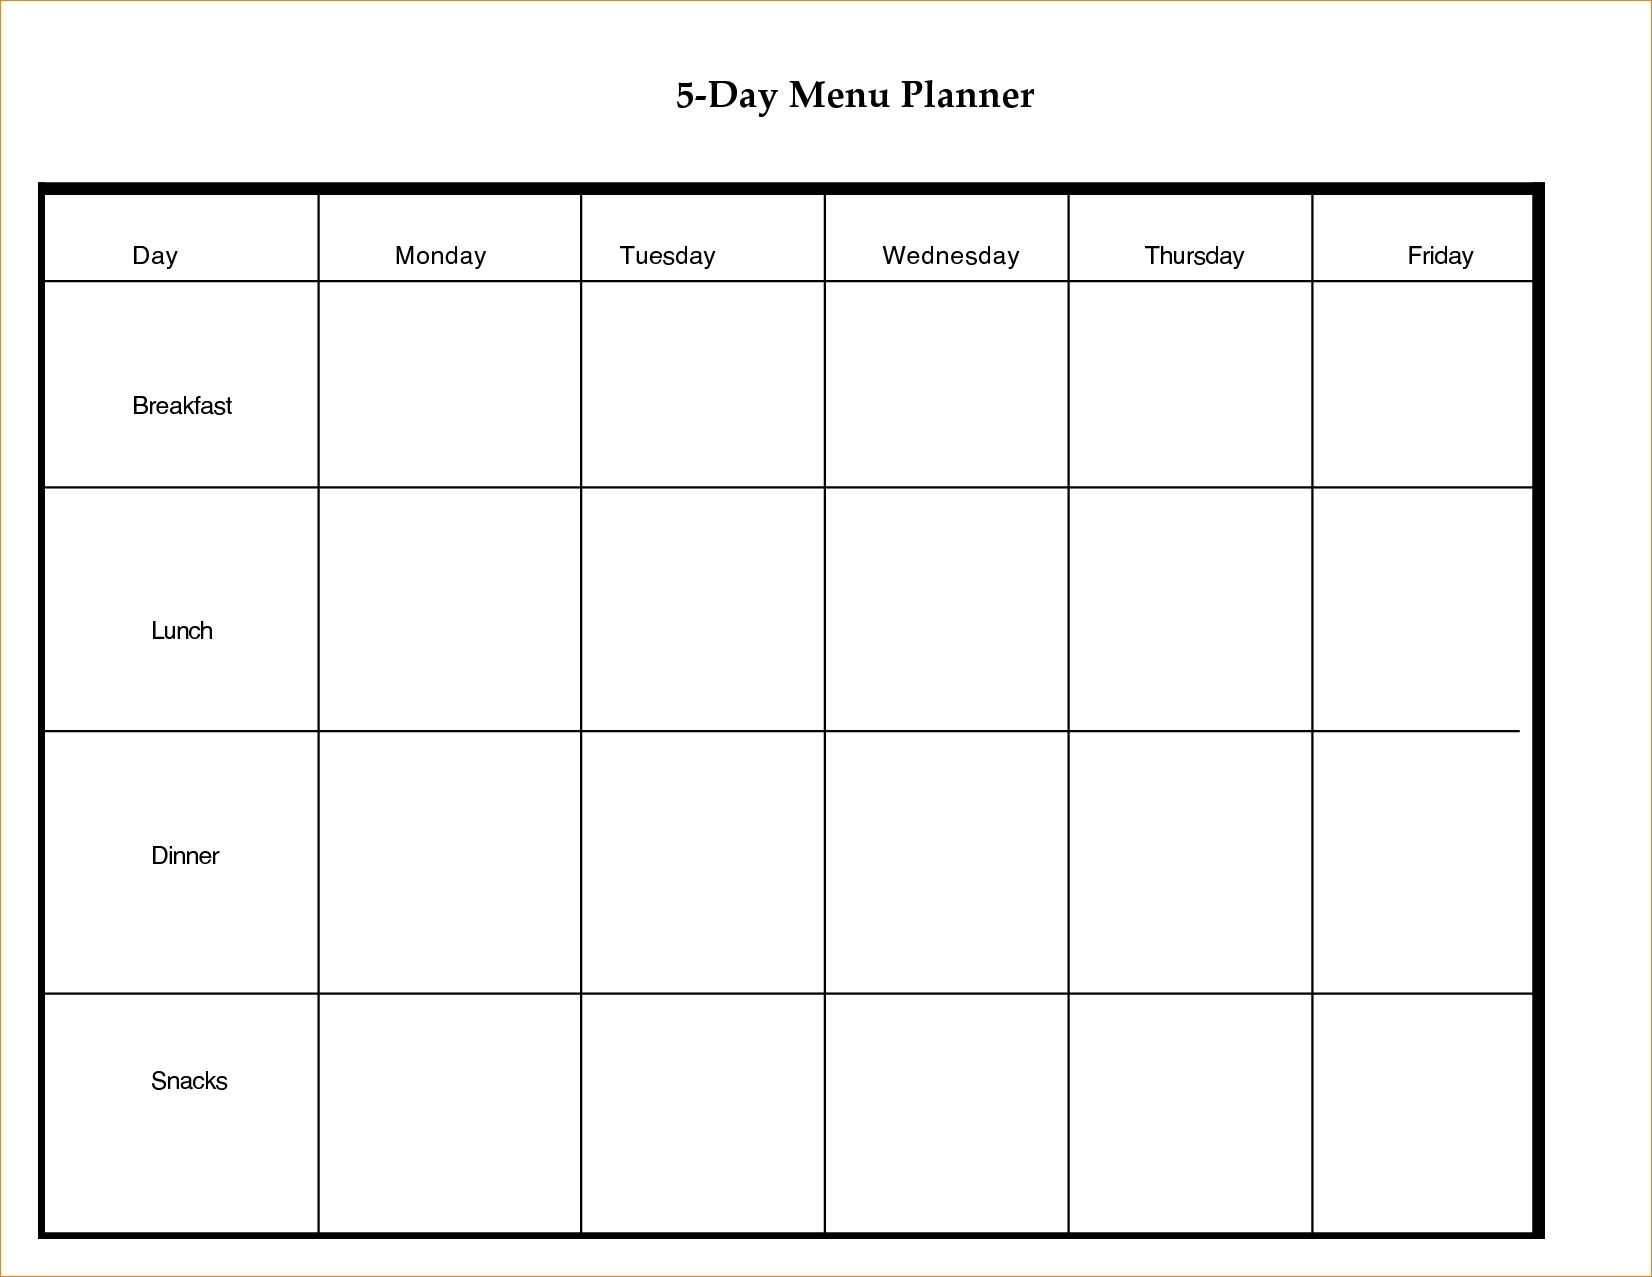 Blank 5 Day Week Calendar | Blank Calendar Template Dowload throughout 5 Day Weekly Planner Template